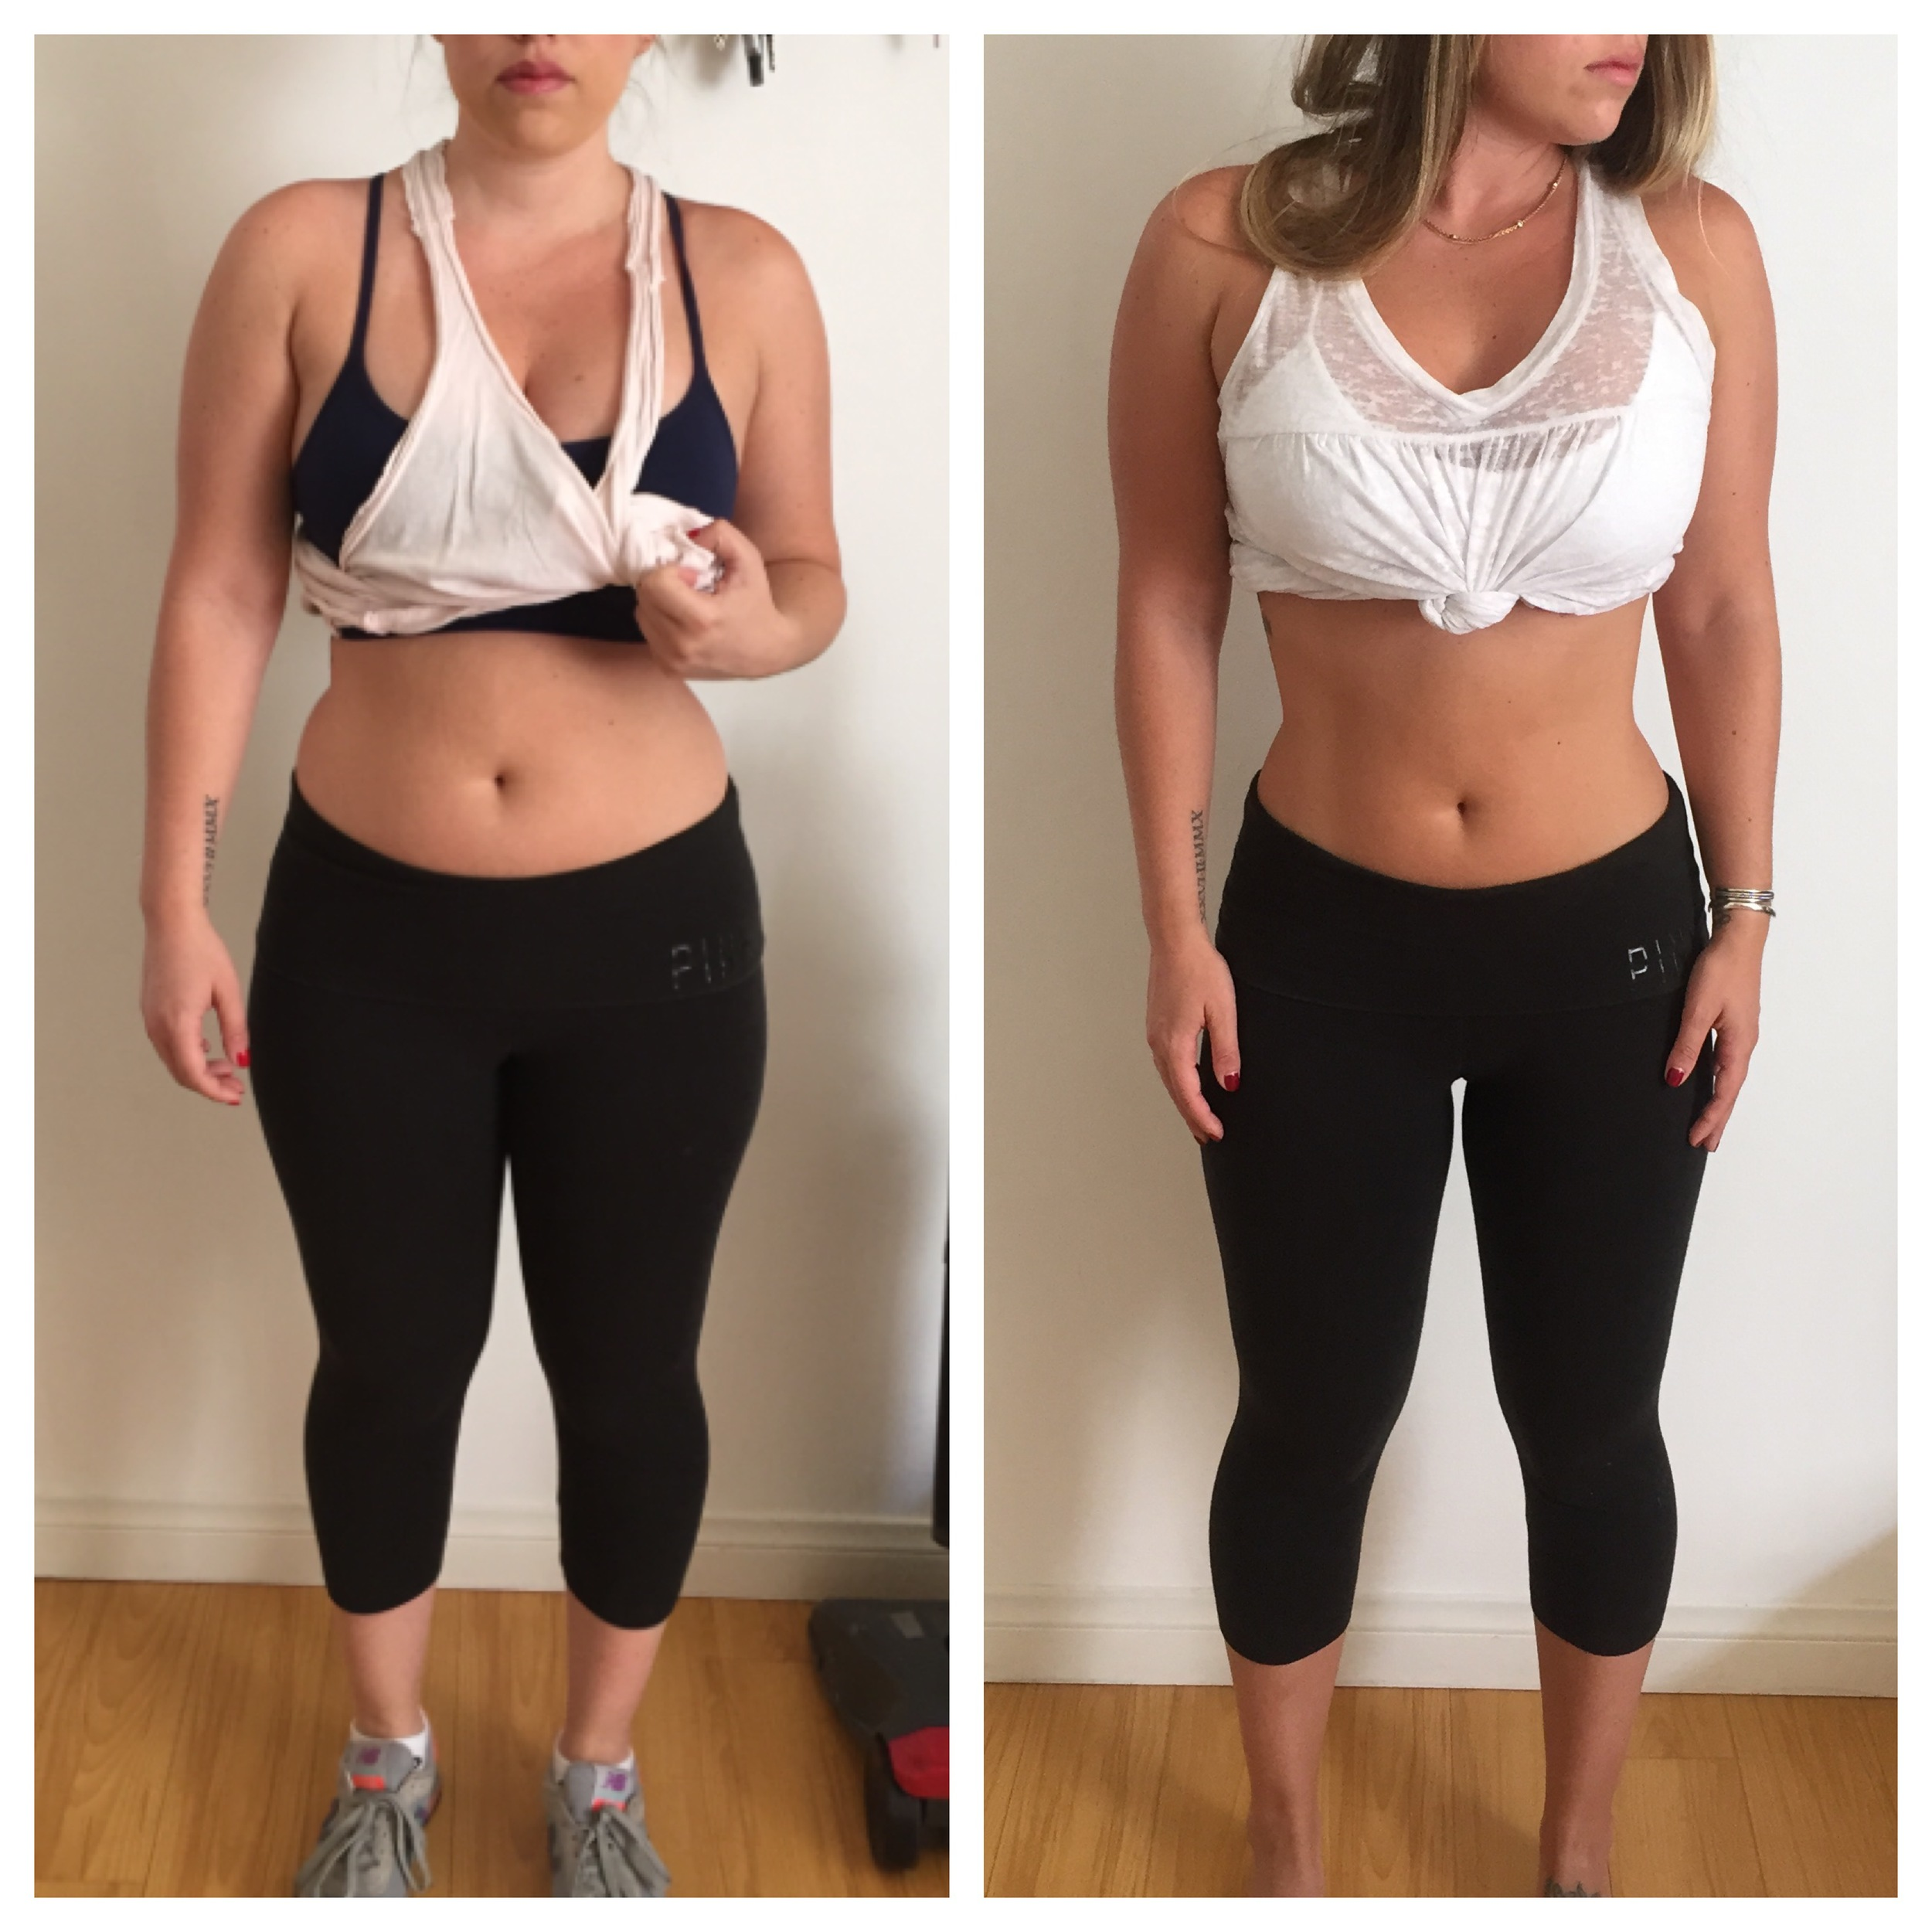 Sarah Lindsay Transformation